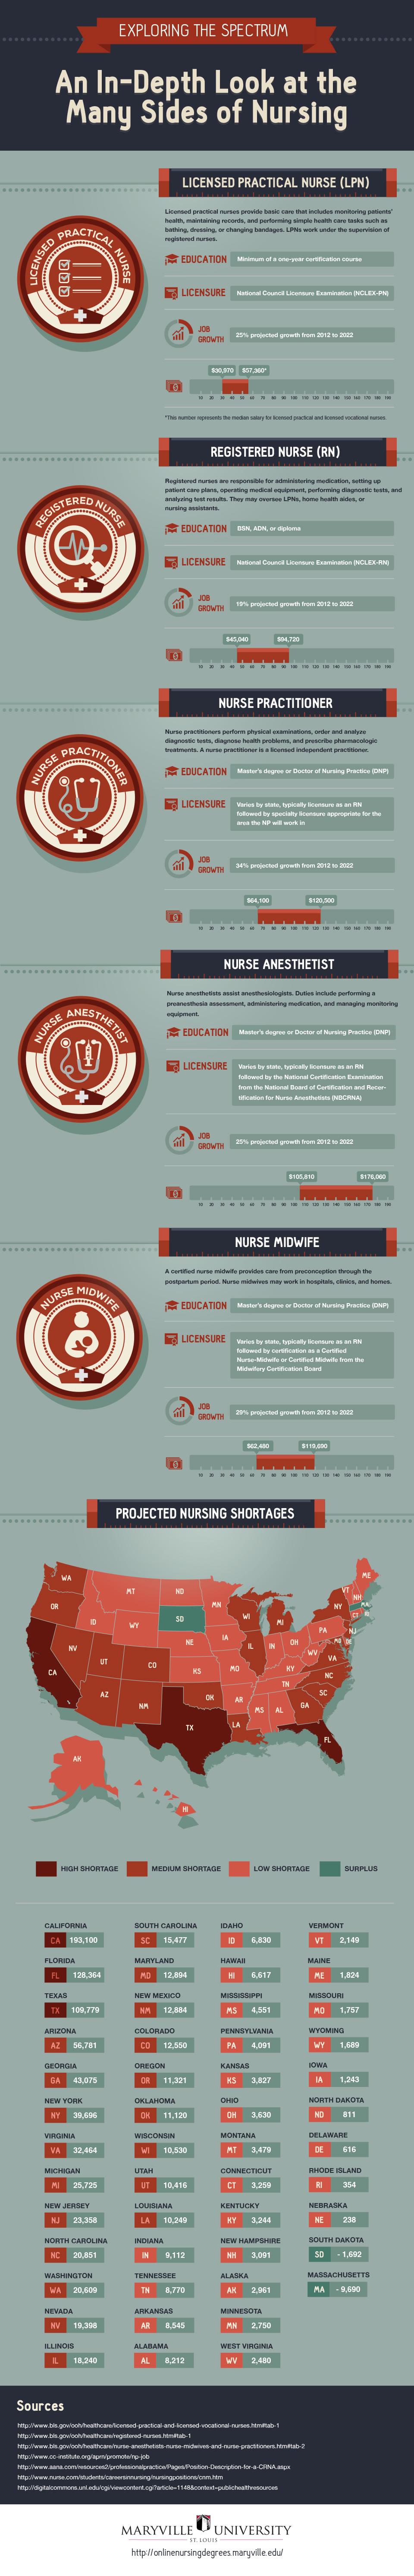 Maryland University_Nurse Infographic _Ankota Home Care blog